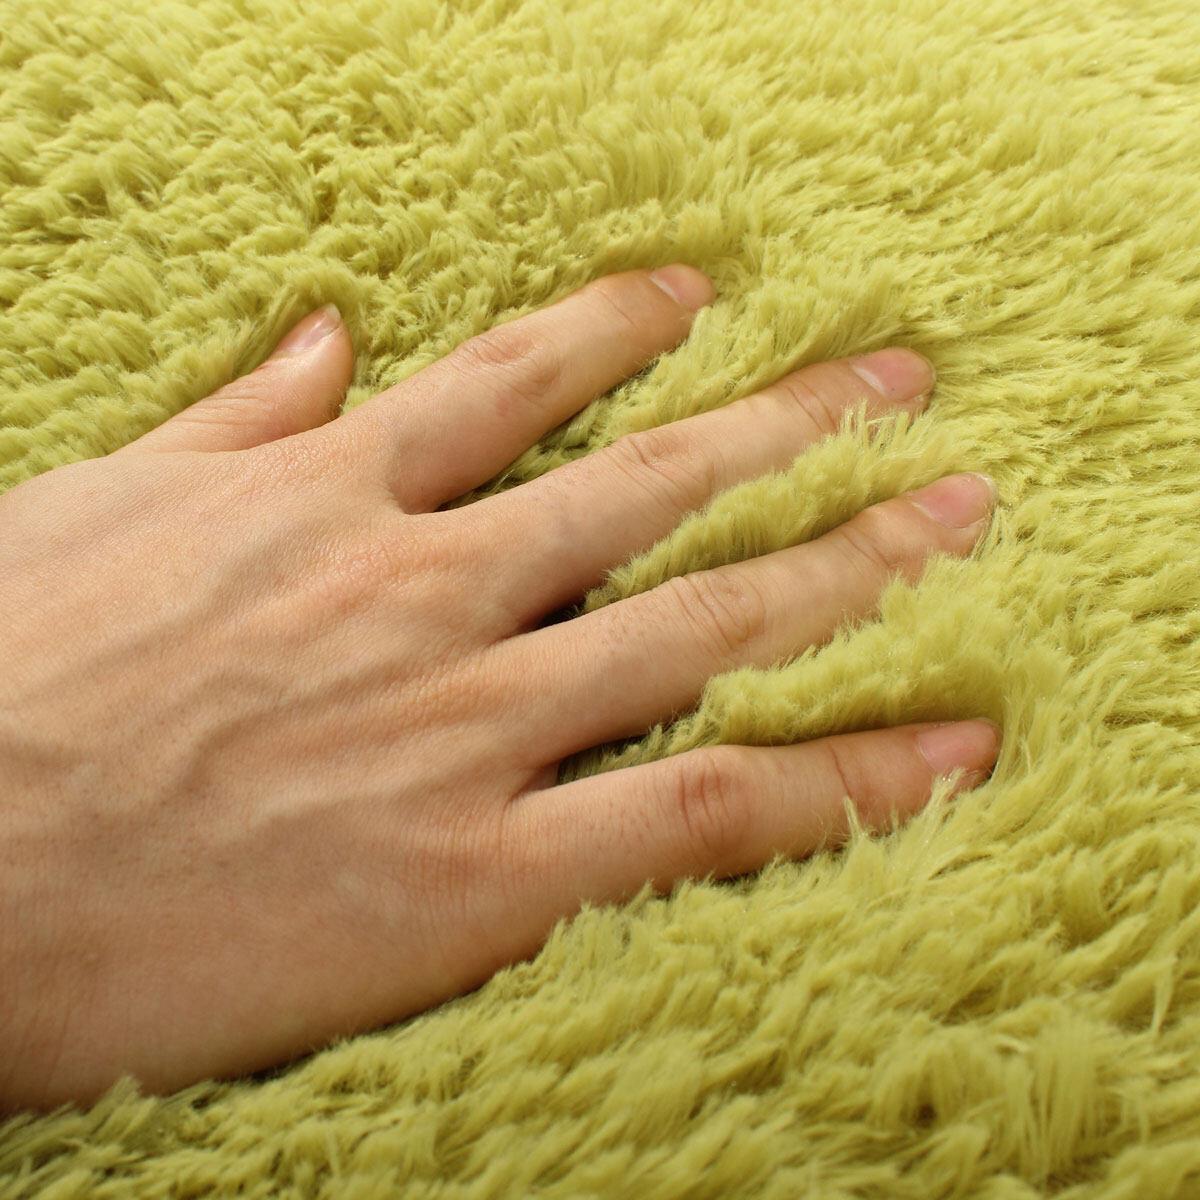 Generic Shaggy Anti-skid Carpets Rugs Floor Mat/Cover 80x120cm Grass Green @ Best Price Online | Jumia Kenya